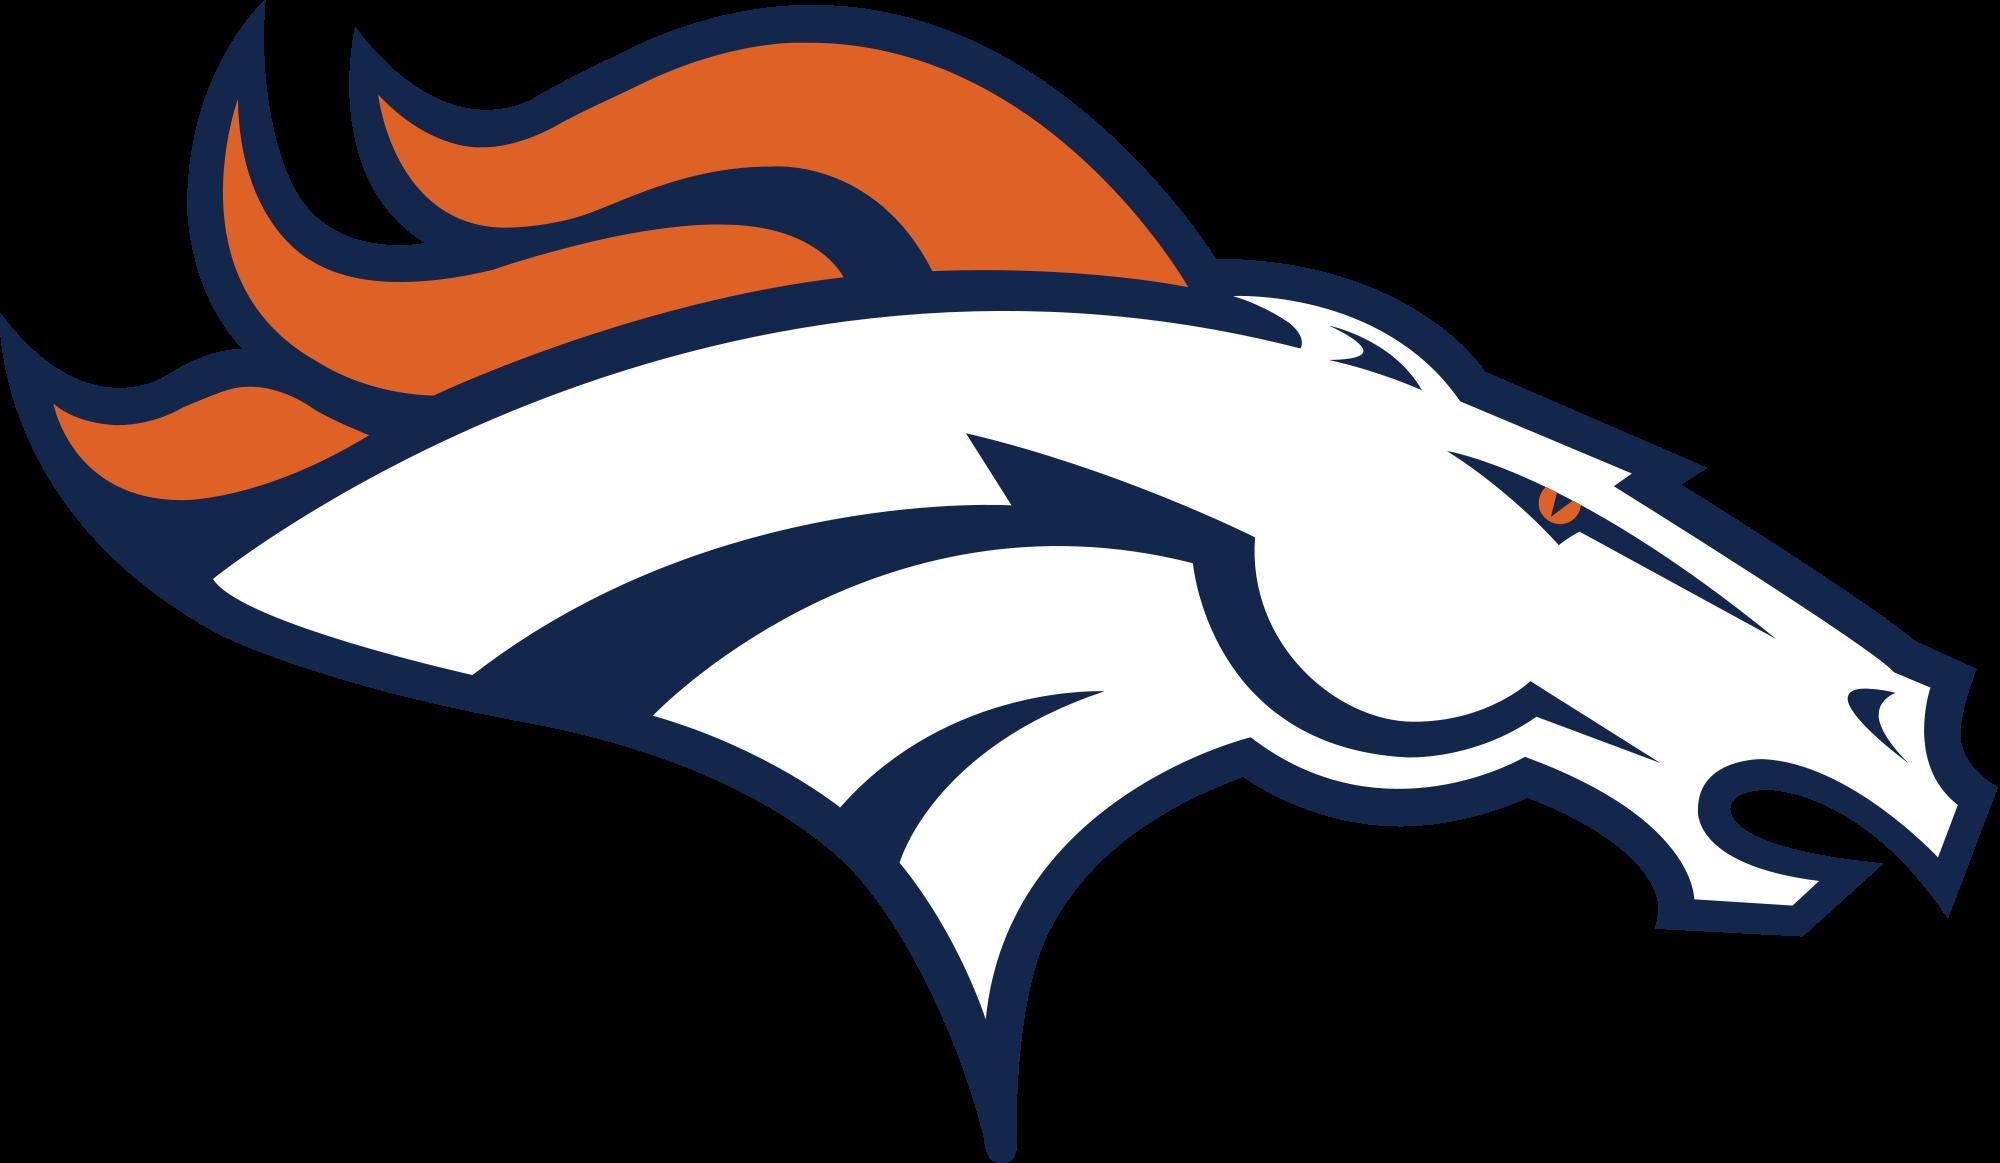 Free Denver Broncos Logo Png, Download Free Clip Art, Free.